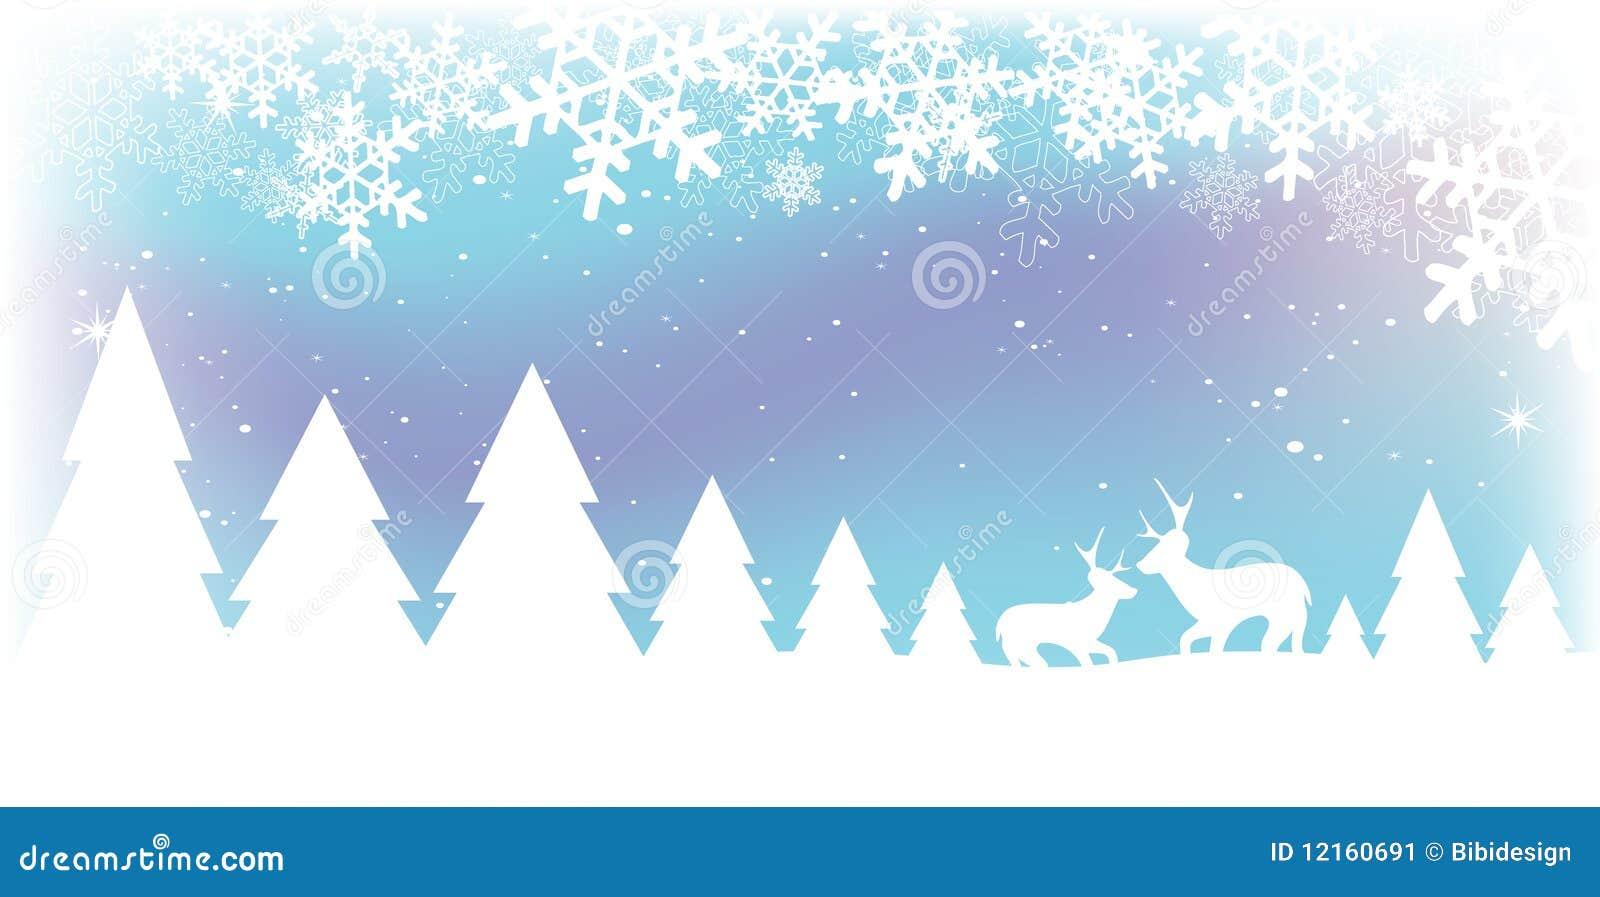 clipart snow scene - photo #47